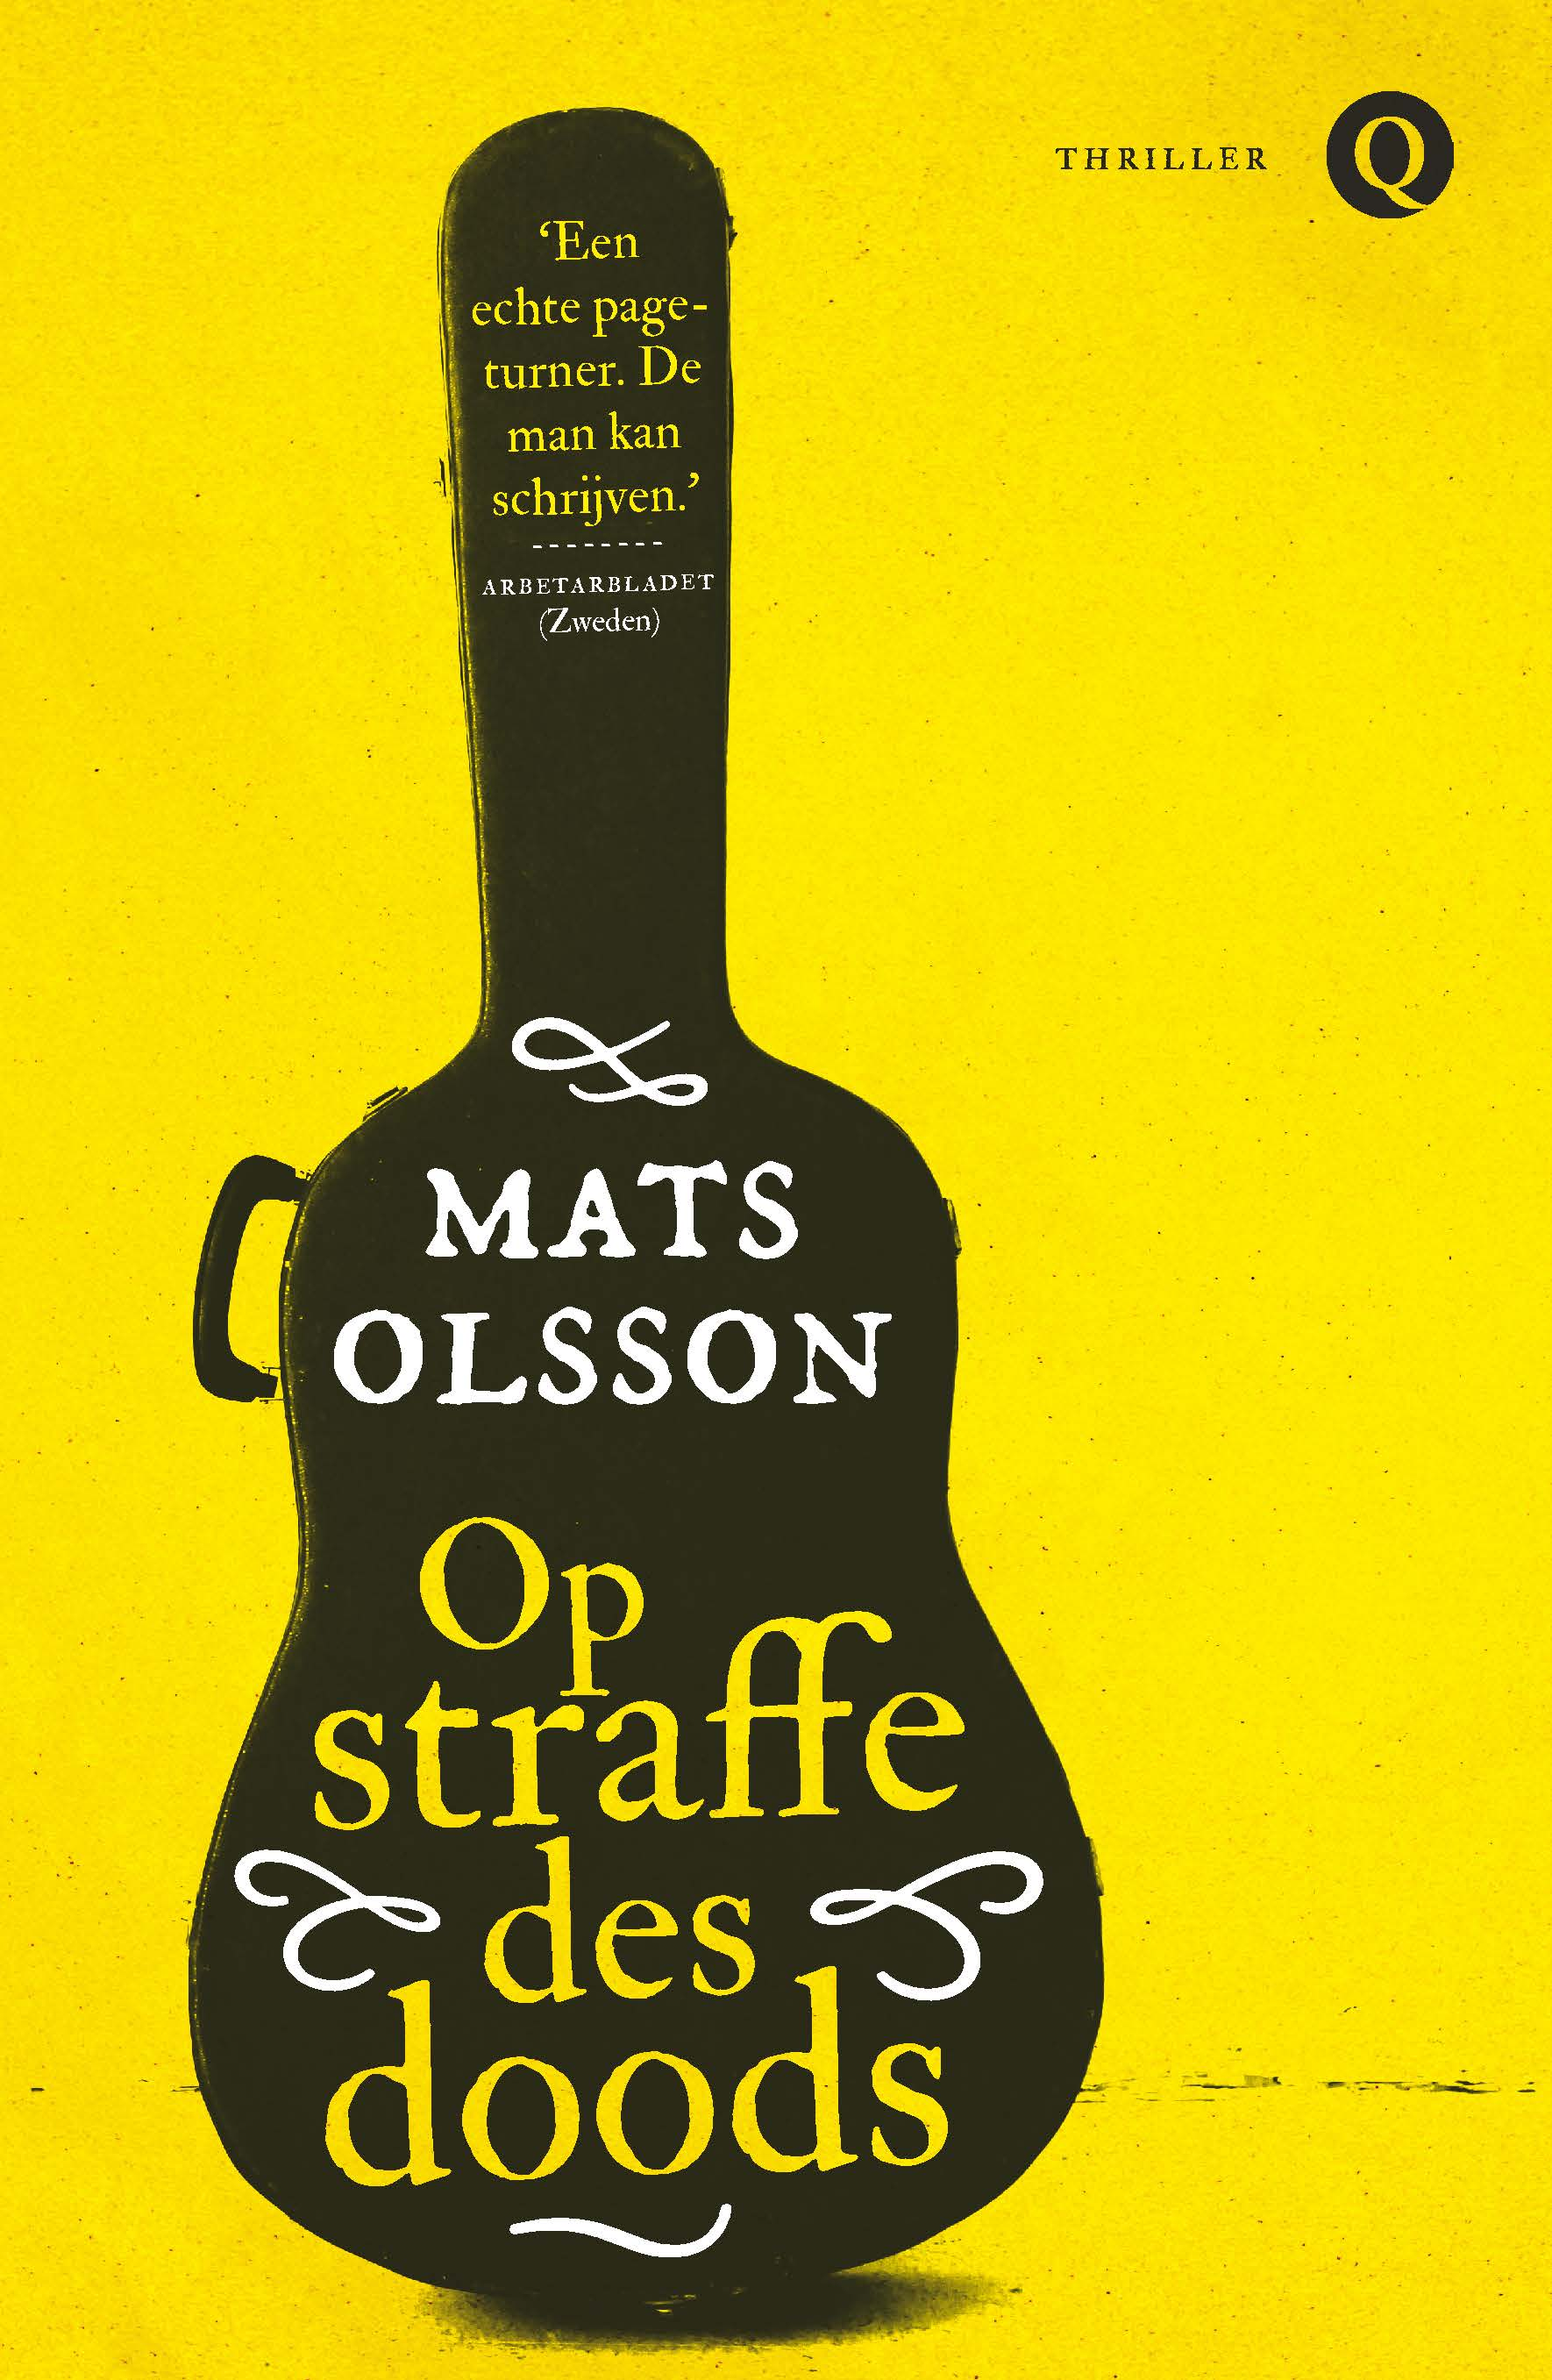 Op straffe des doods – Mats Olsson